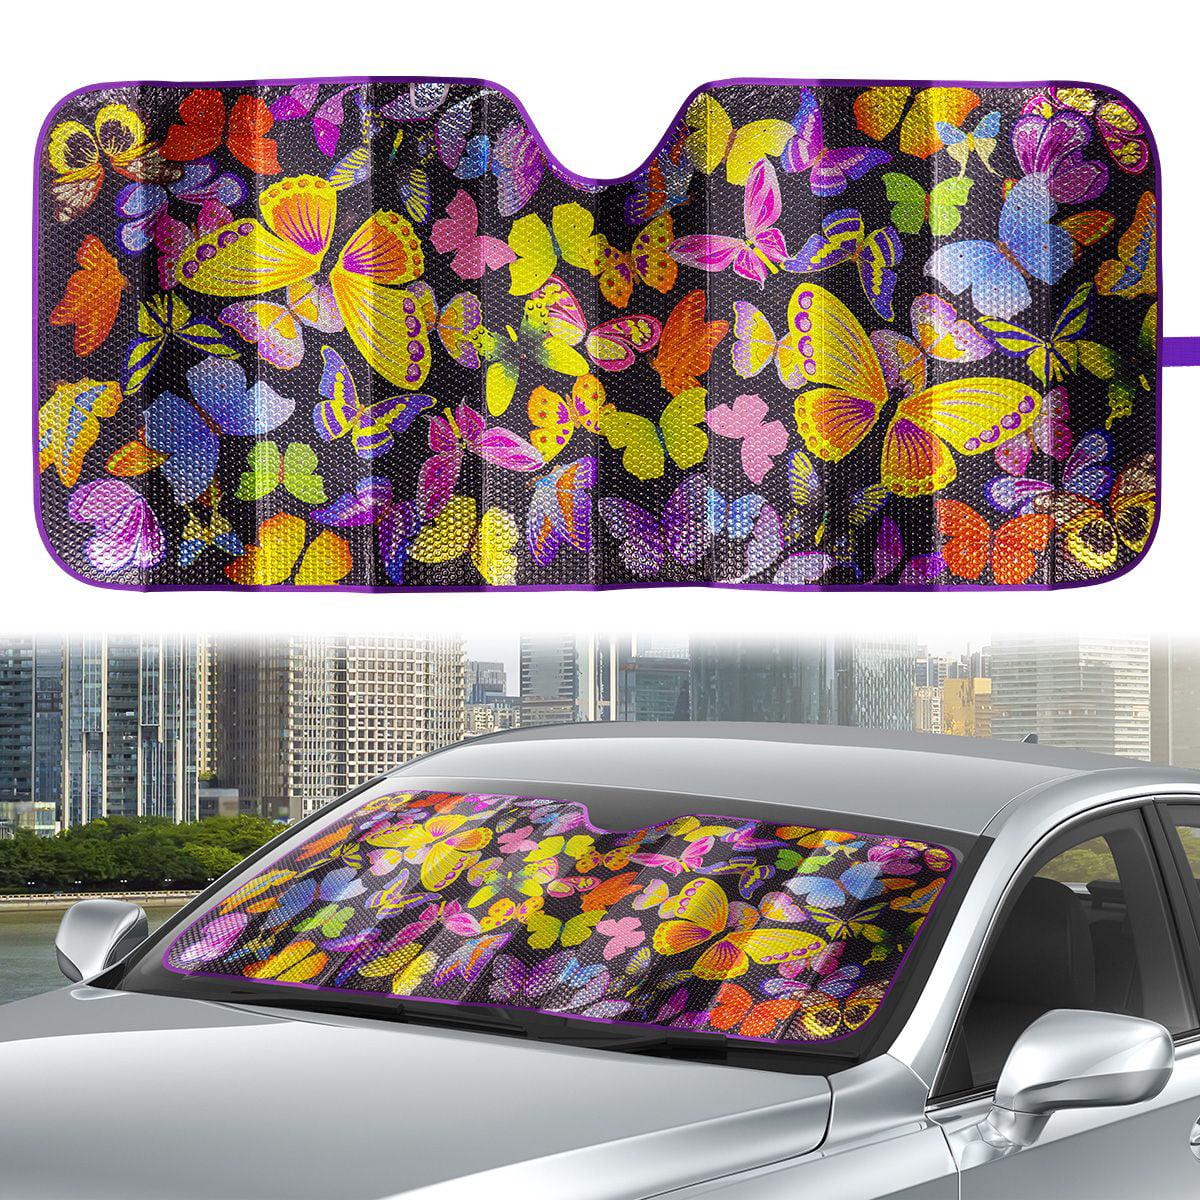 LedBack Car Windshield Sun Shade Purple Crystal Butterfly Pattern Foldable Car Front Window Sunshades for Most Sedan SUV Truck